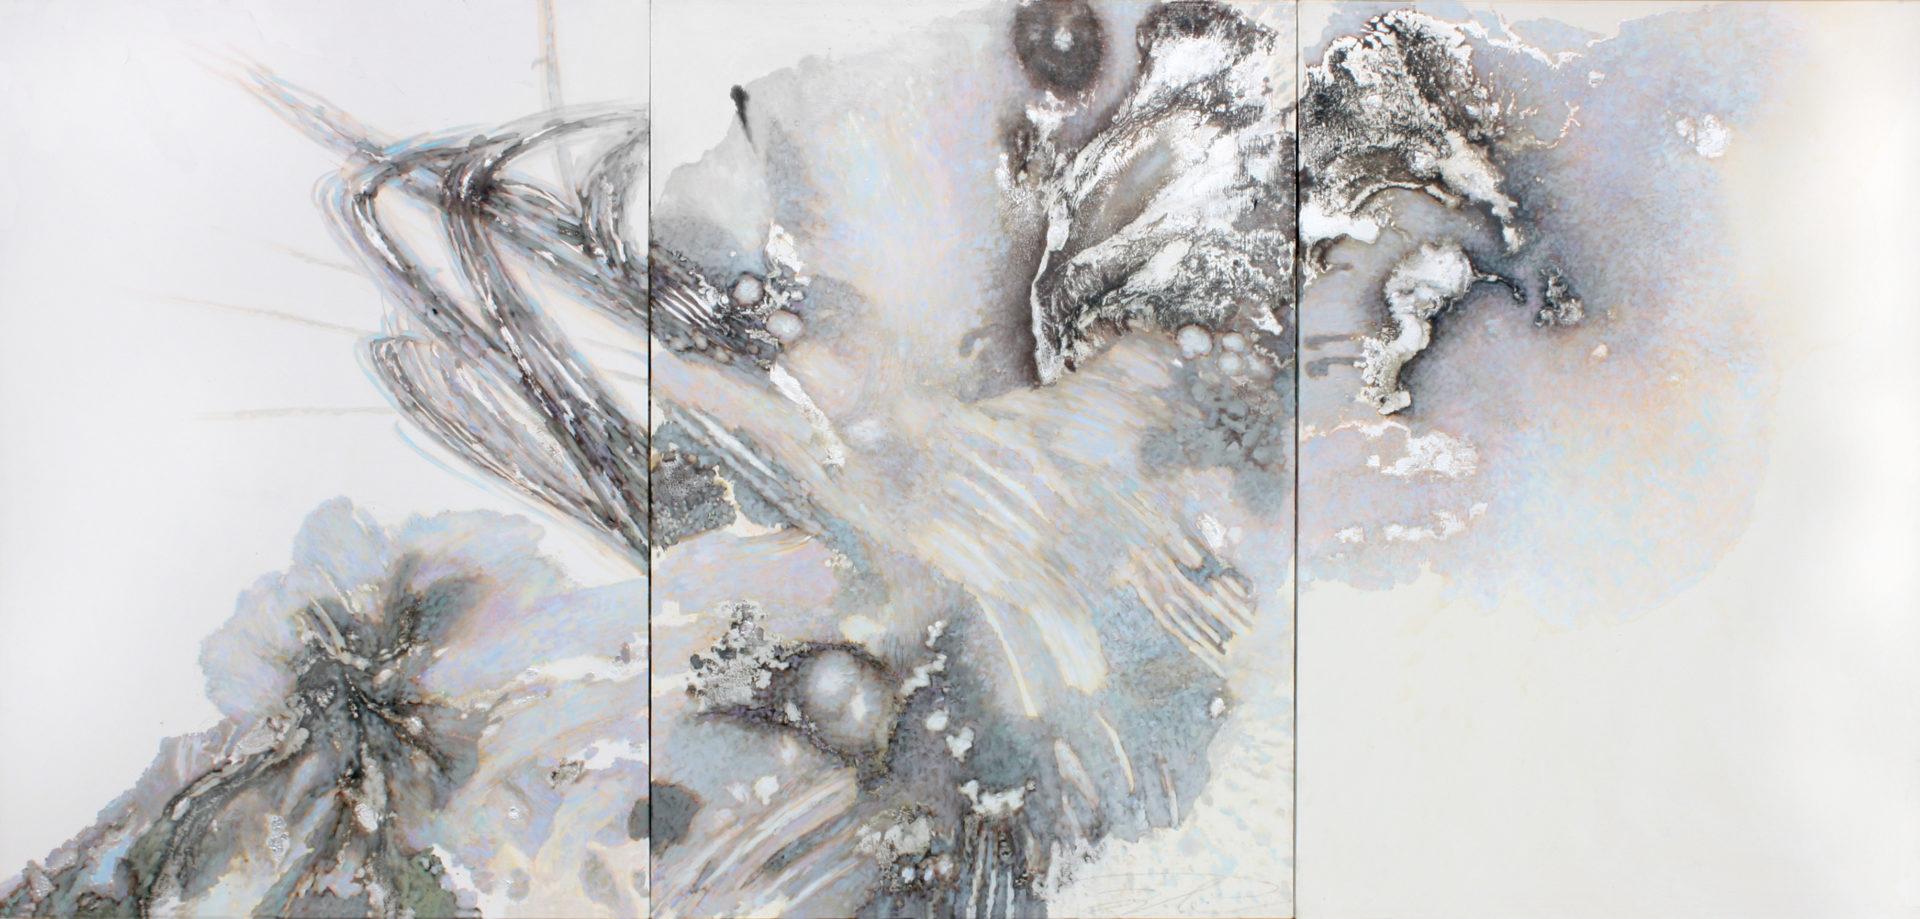 Ali Ibadullayev --- FLYING --- 345 x 165 oil on canvas 2014